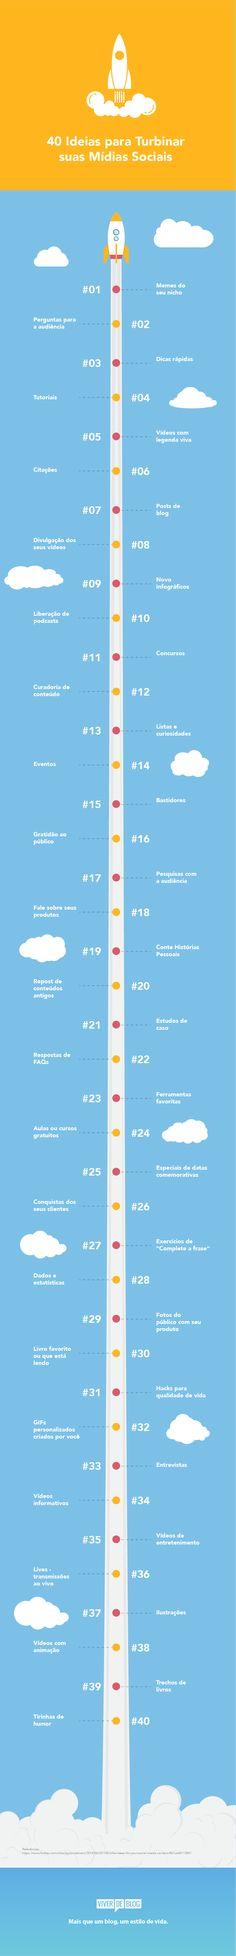 Mídias Sociais: 40 Ideias para Postagens